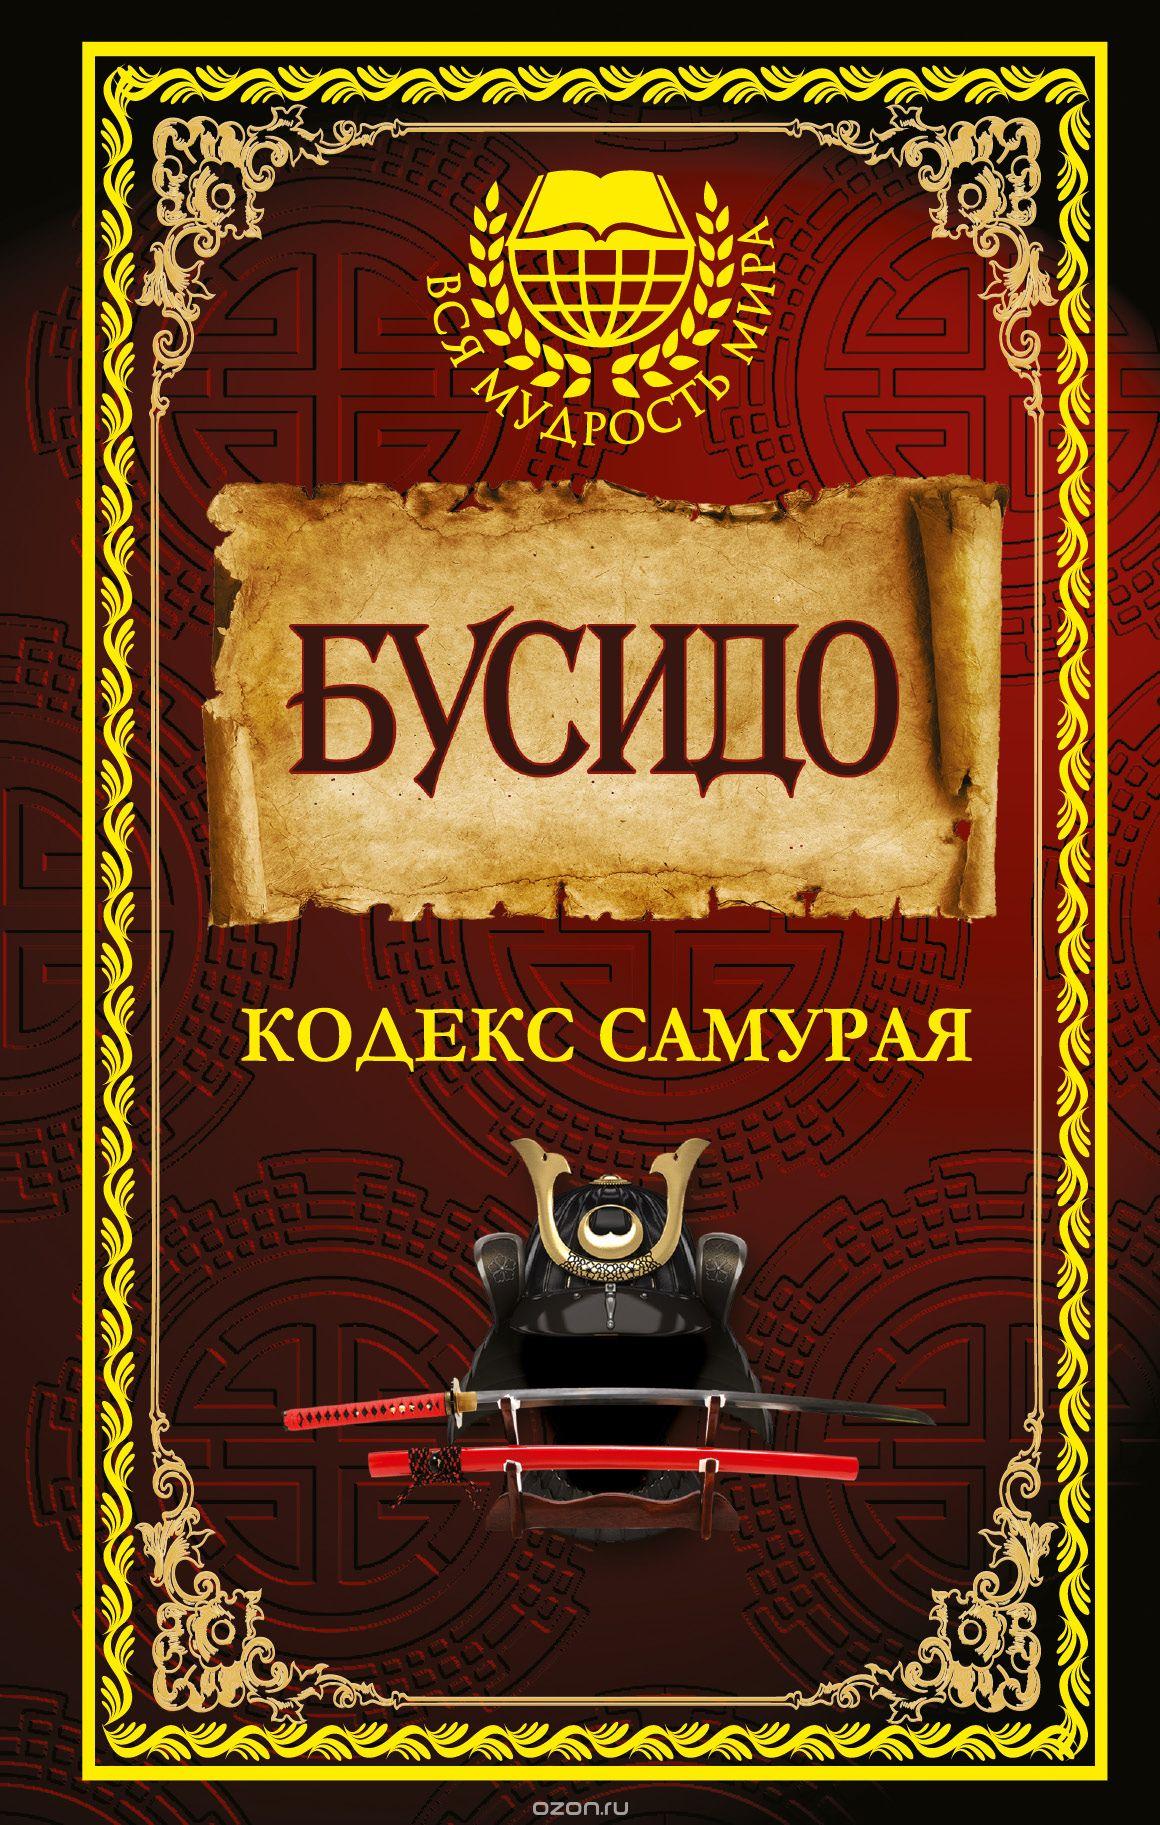 Книга на русском языке «Бусидо. Кодекс самурая»